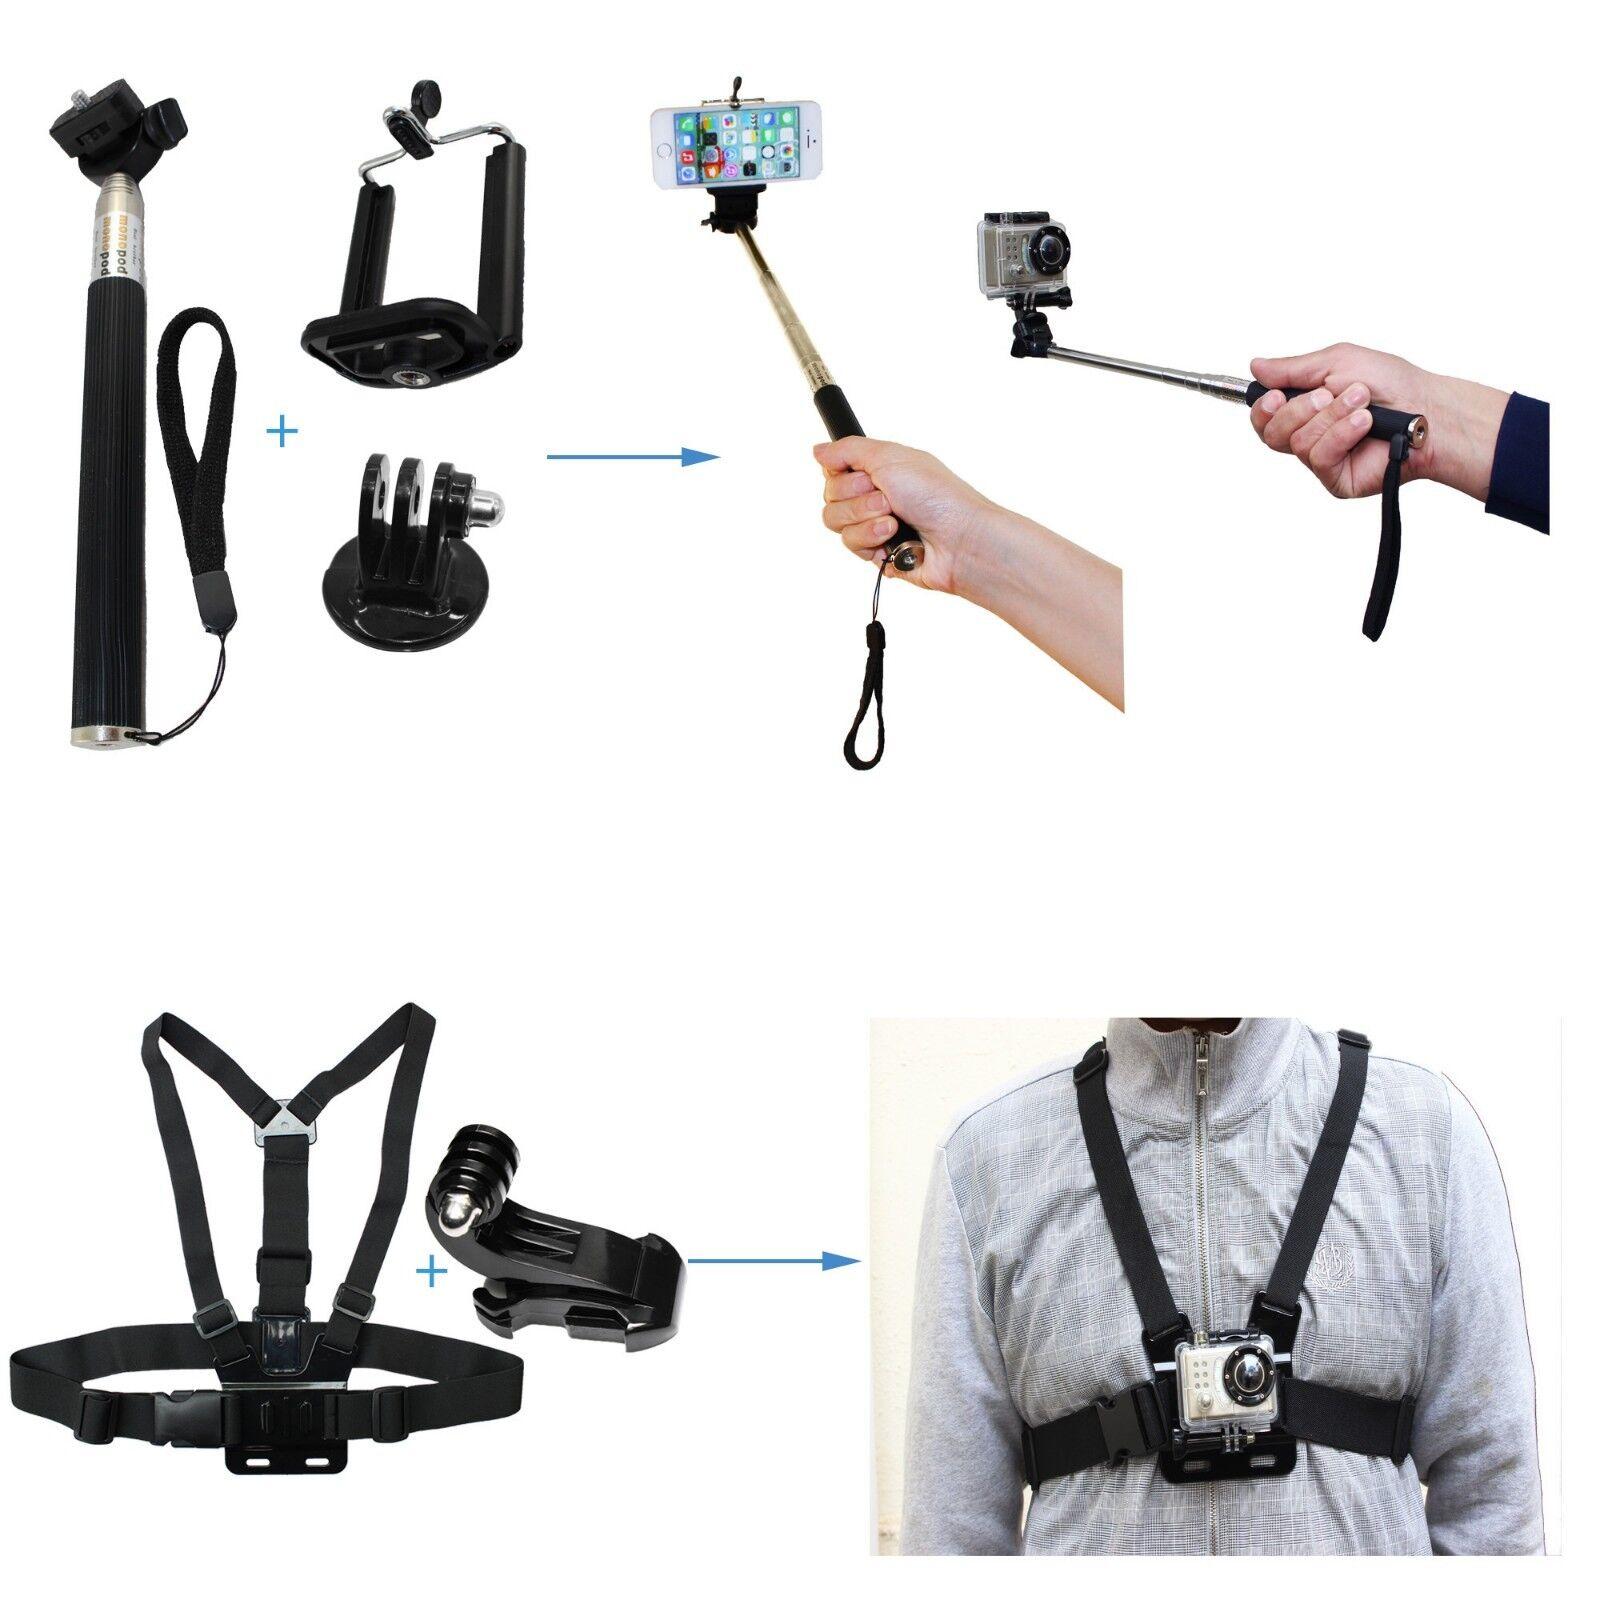 GoPro HERO7 Black Action Camera Accessories Kit For Go Pro Hero 6/5/4 New Model 12